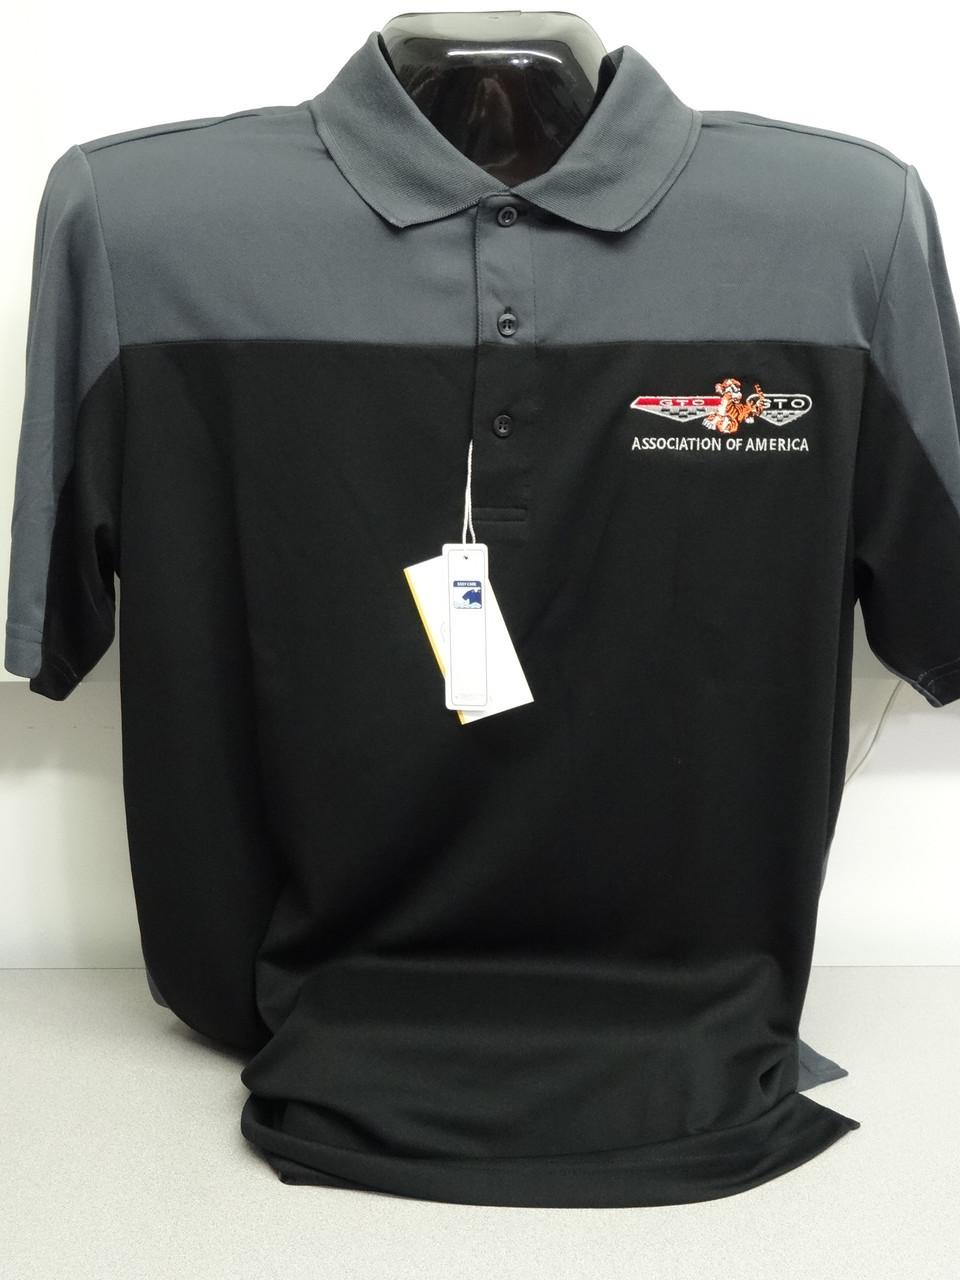 Cool N Dry Gto Association Of America Polo Shirt Custom Auto Apparel